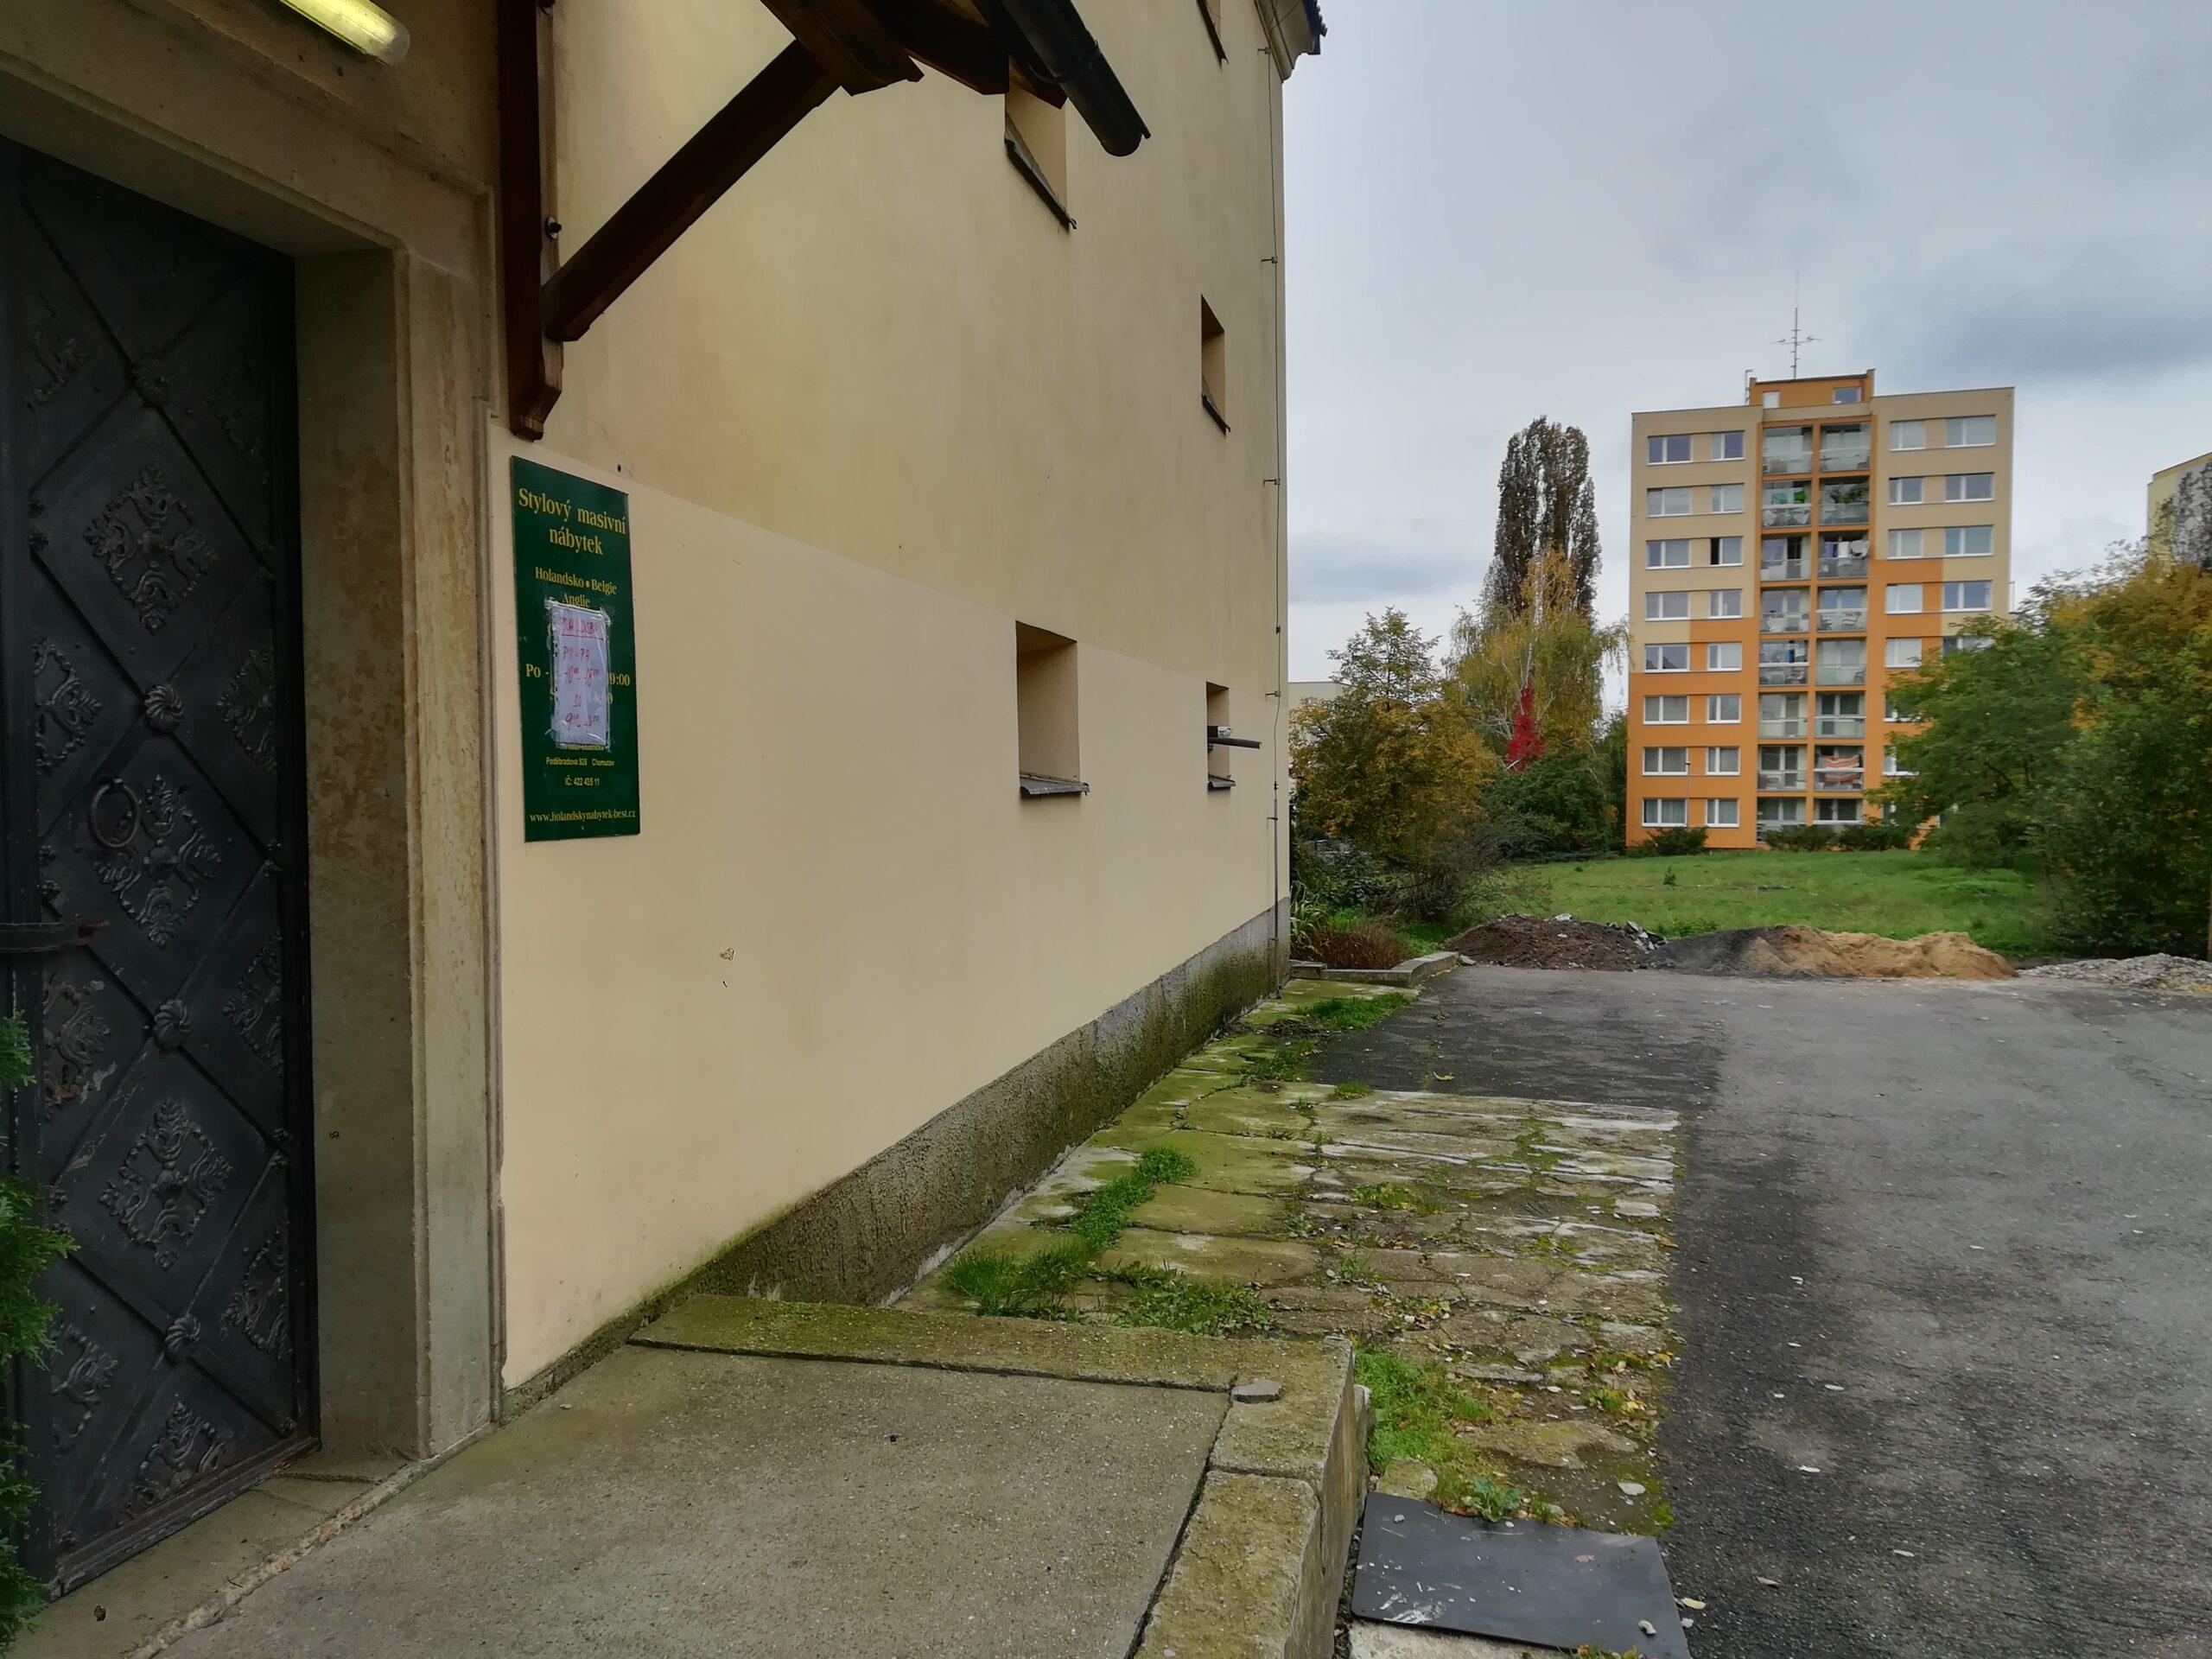 Nový bytový dům v pražských Záběhlicích